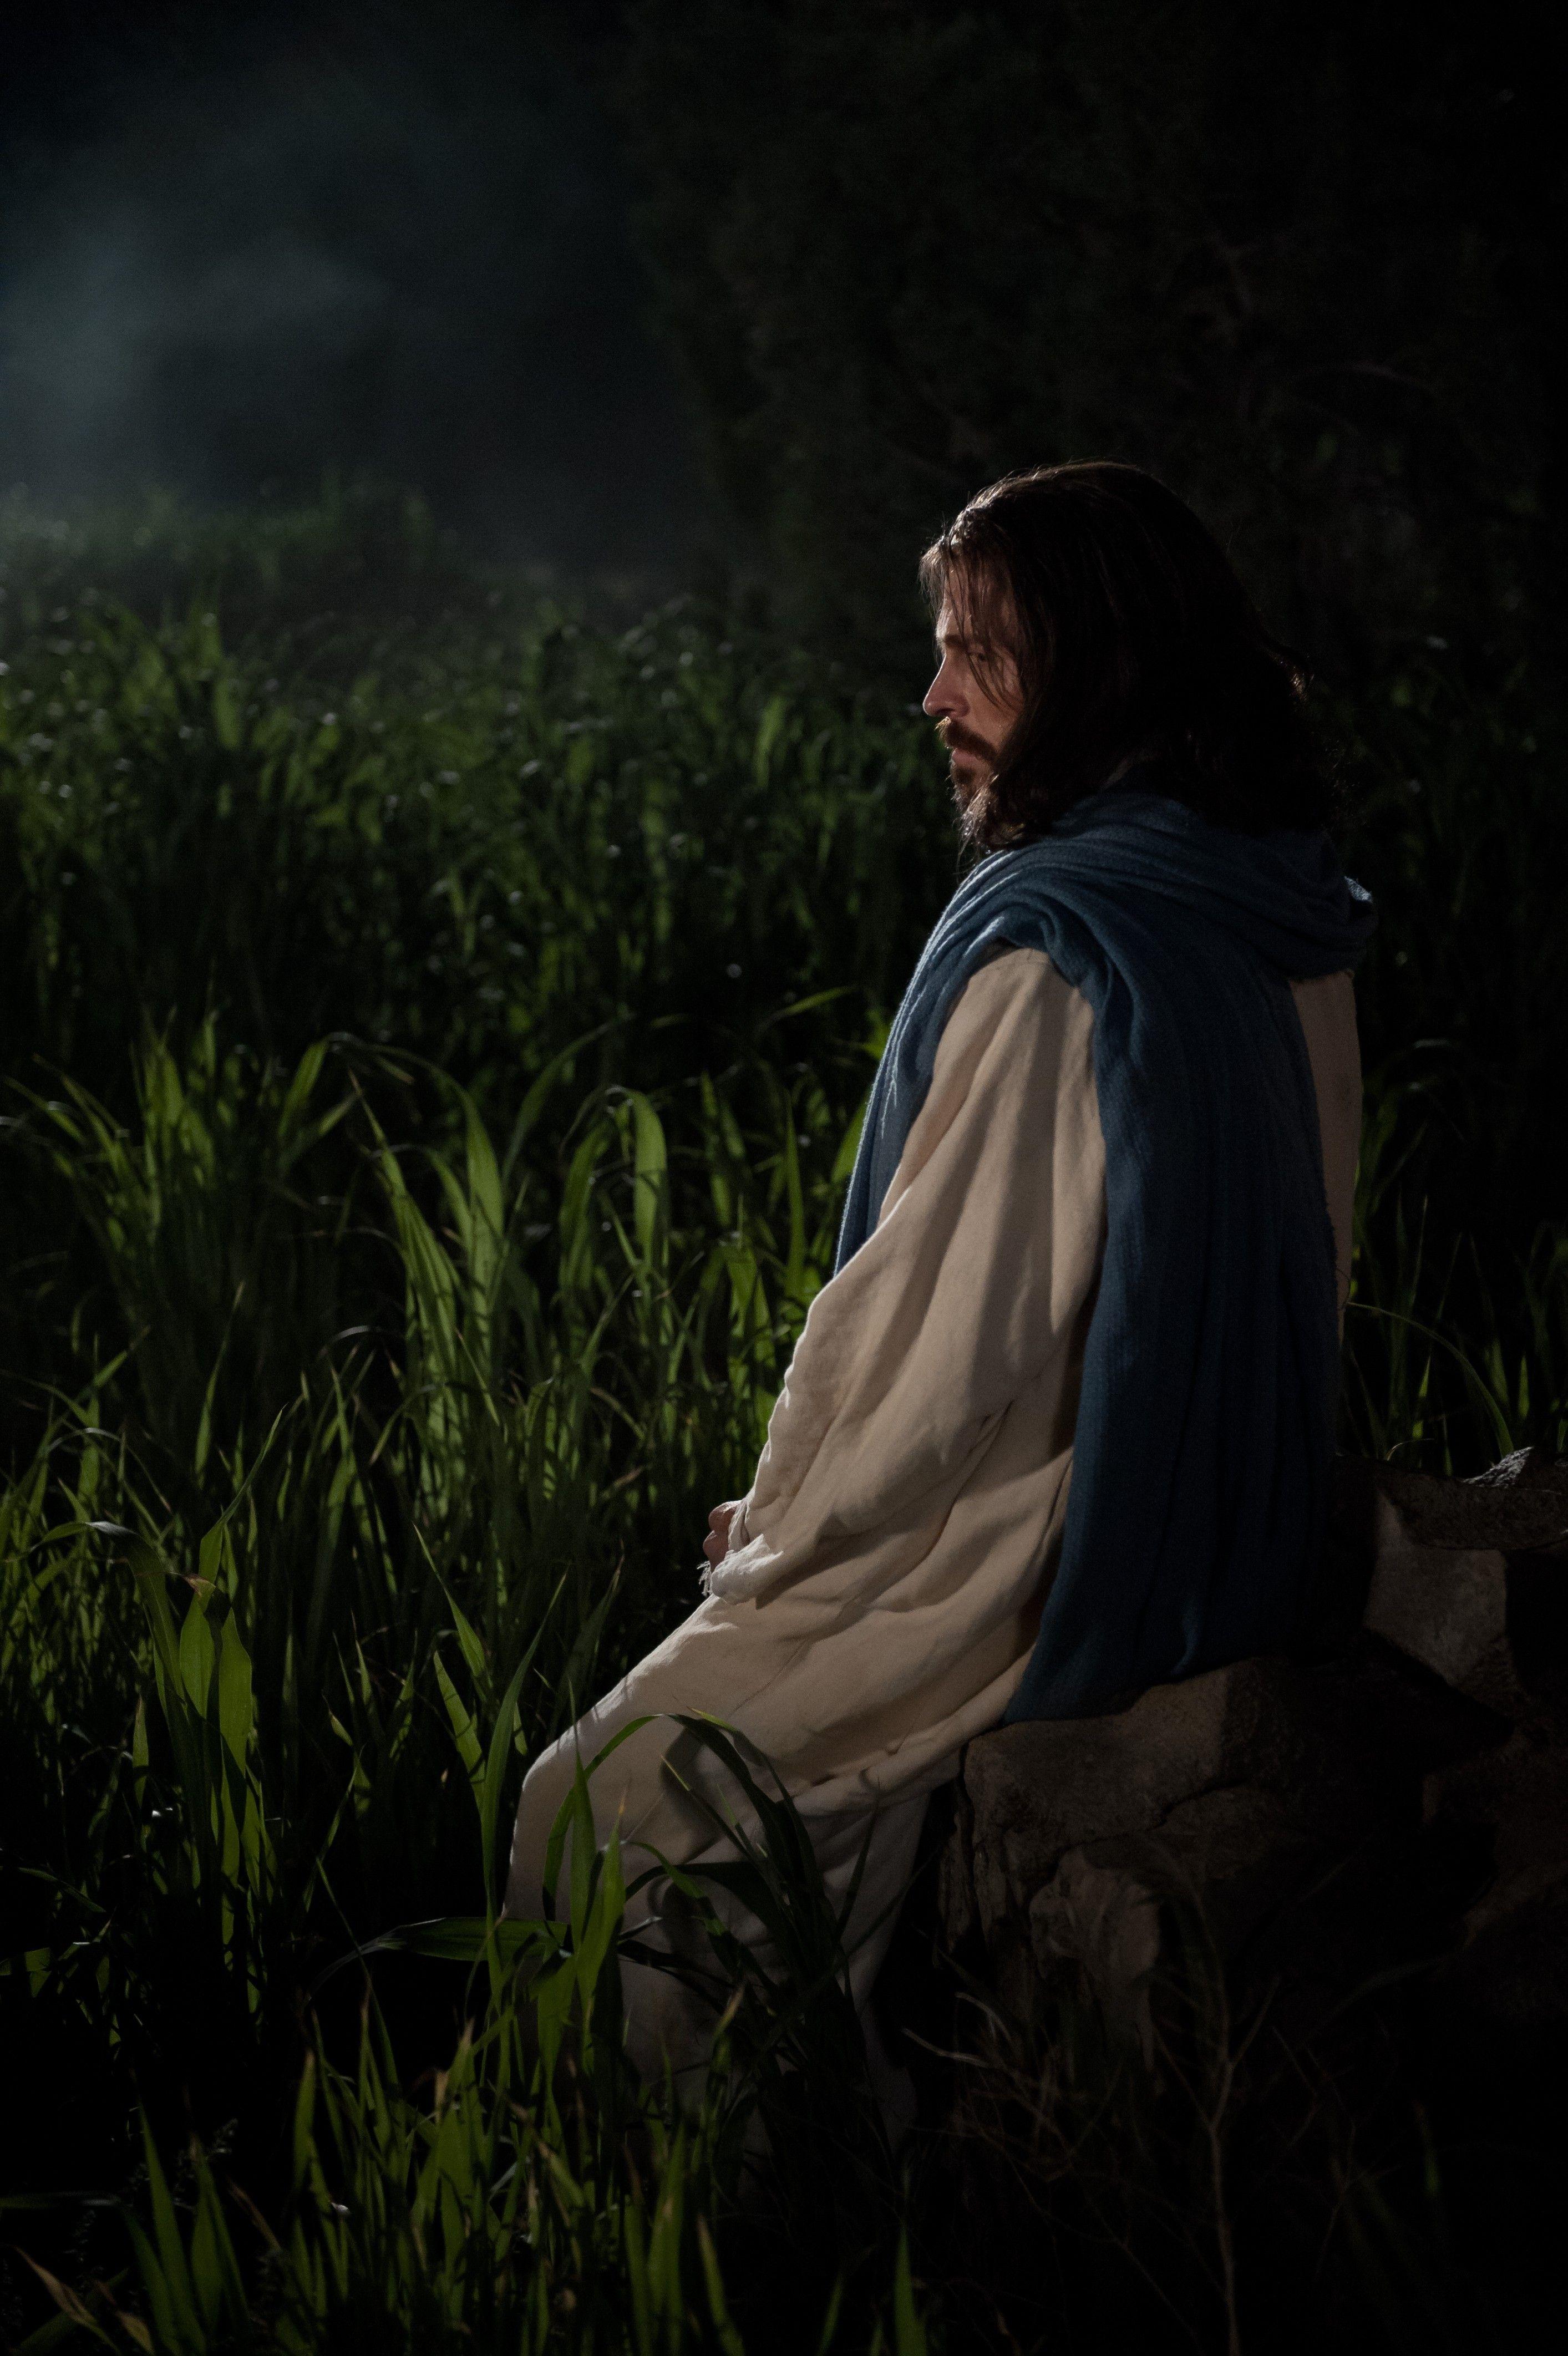 Christ kneeling and praying in Gethsemane.